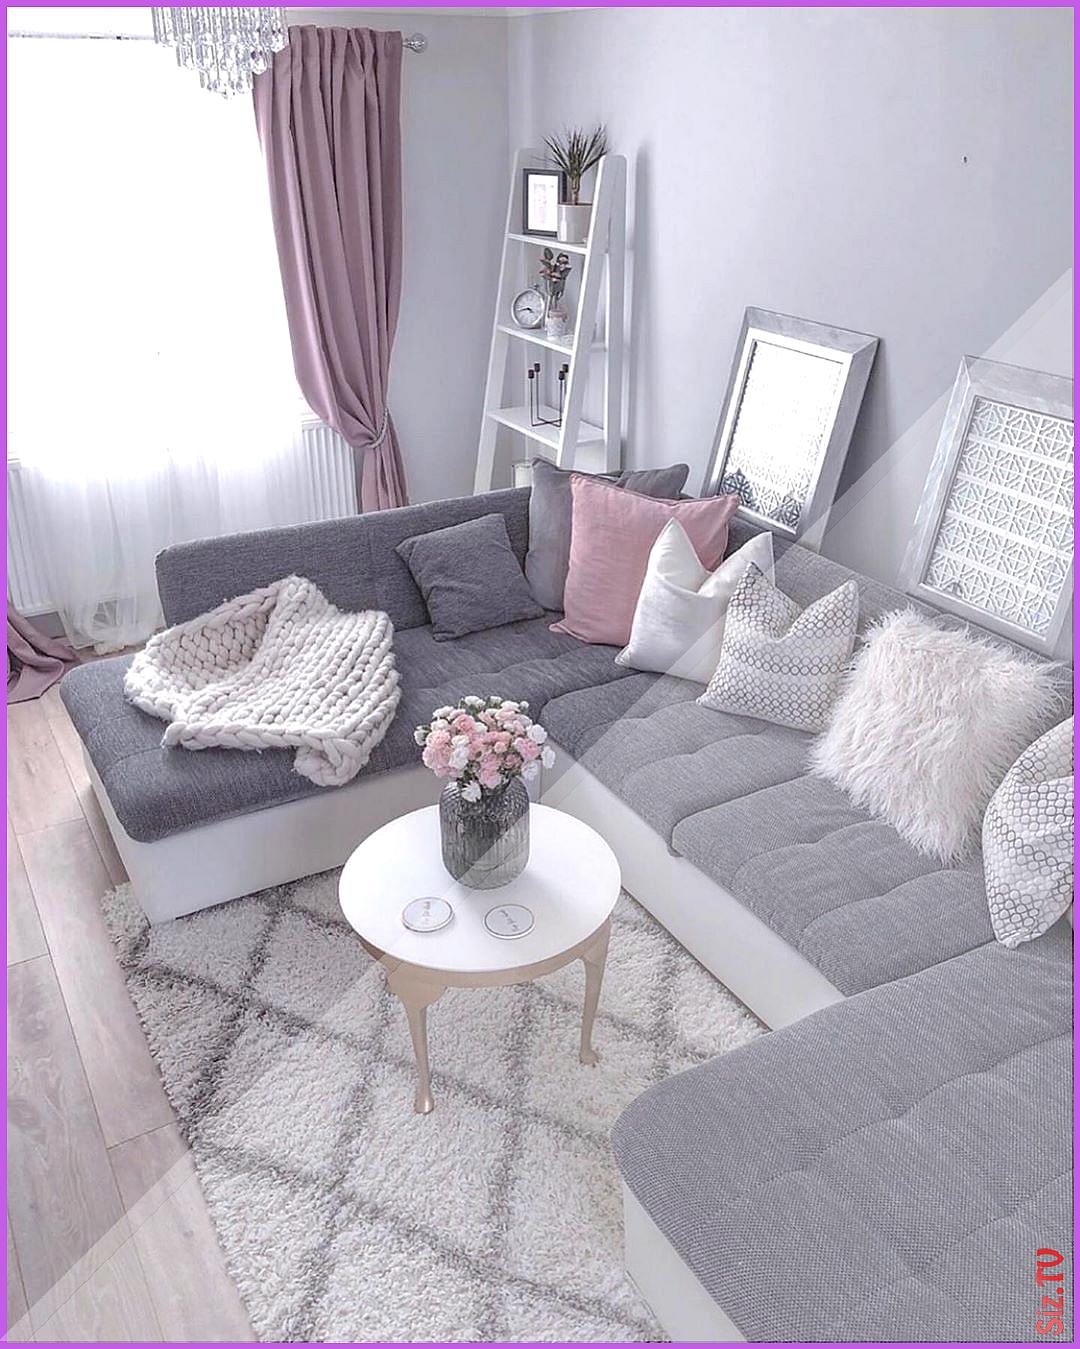 Amazing living room transformation SWIPE By lookwhatinspiresme piece4hom Amazing living room transformation SWIPE By lookwhatinspiresme piece4hom Nicki nicki7304 Einricht...